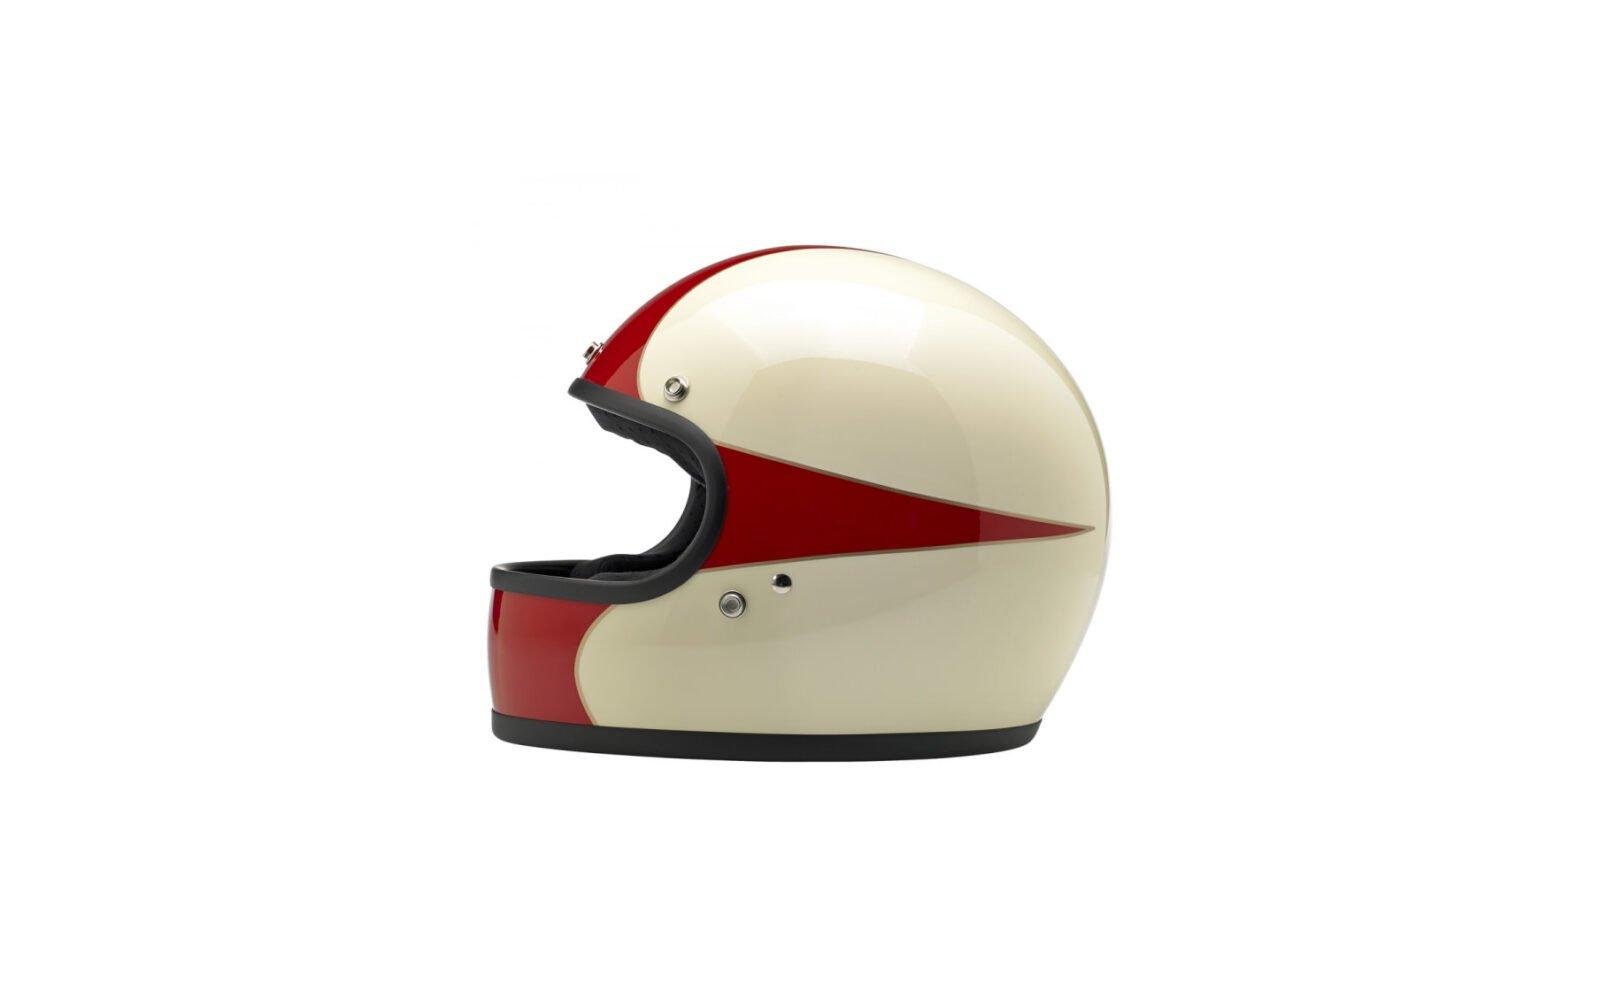 Biltwell LE Scallop Gringo Helmet 1600x1007 - Biltwell LE Scallop Gringo Helmet